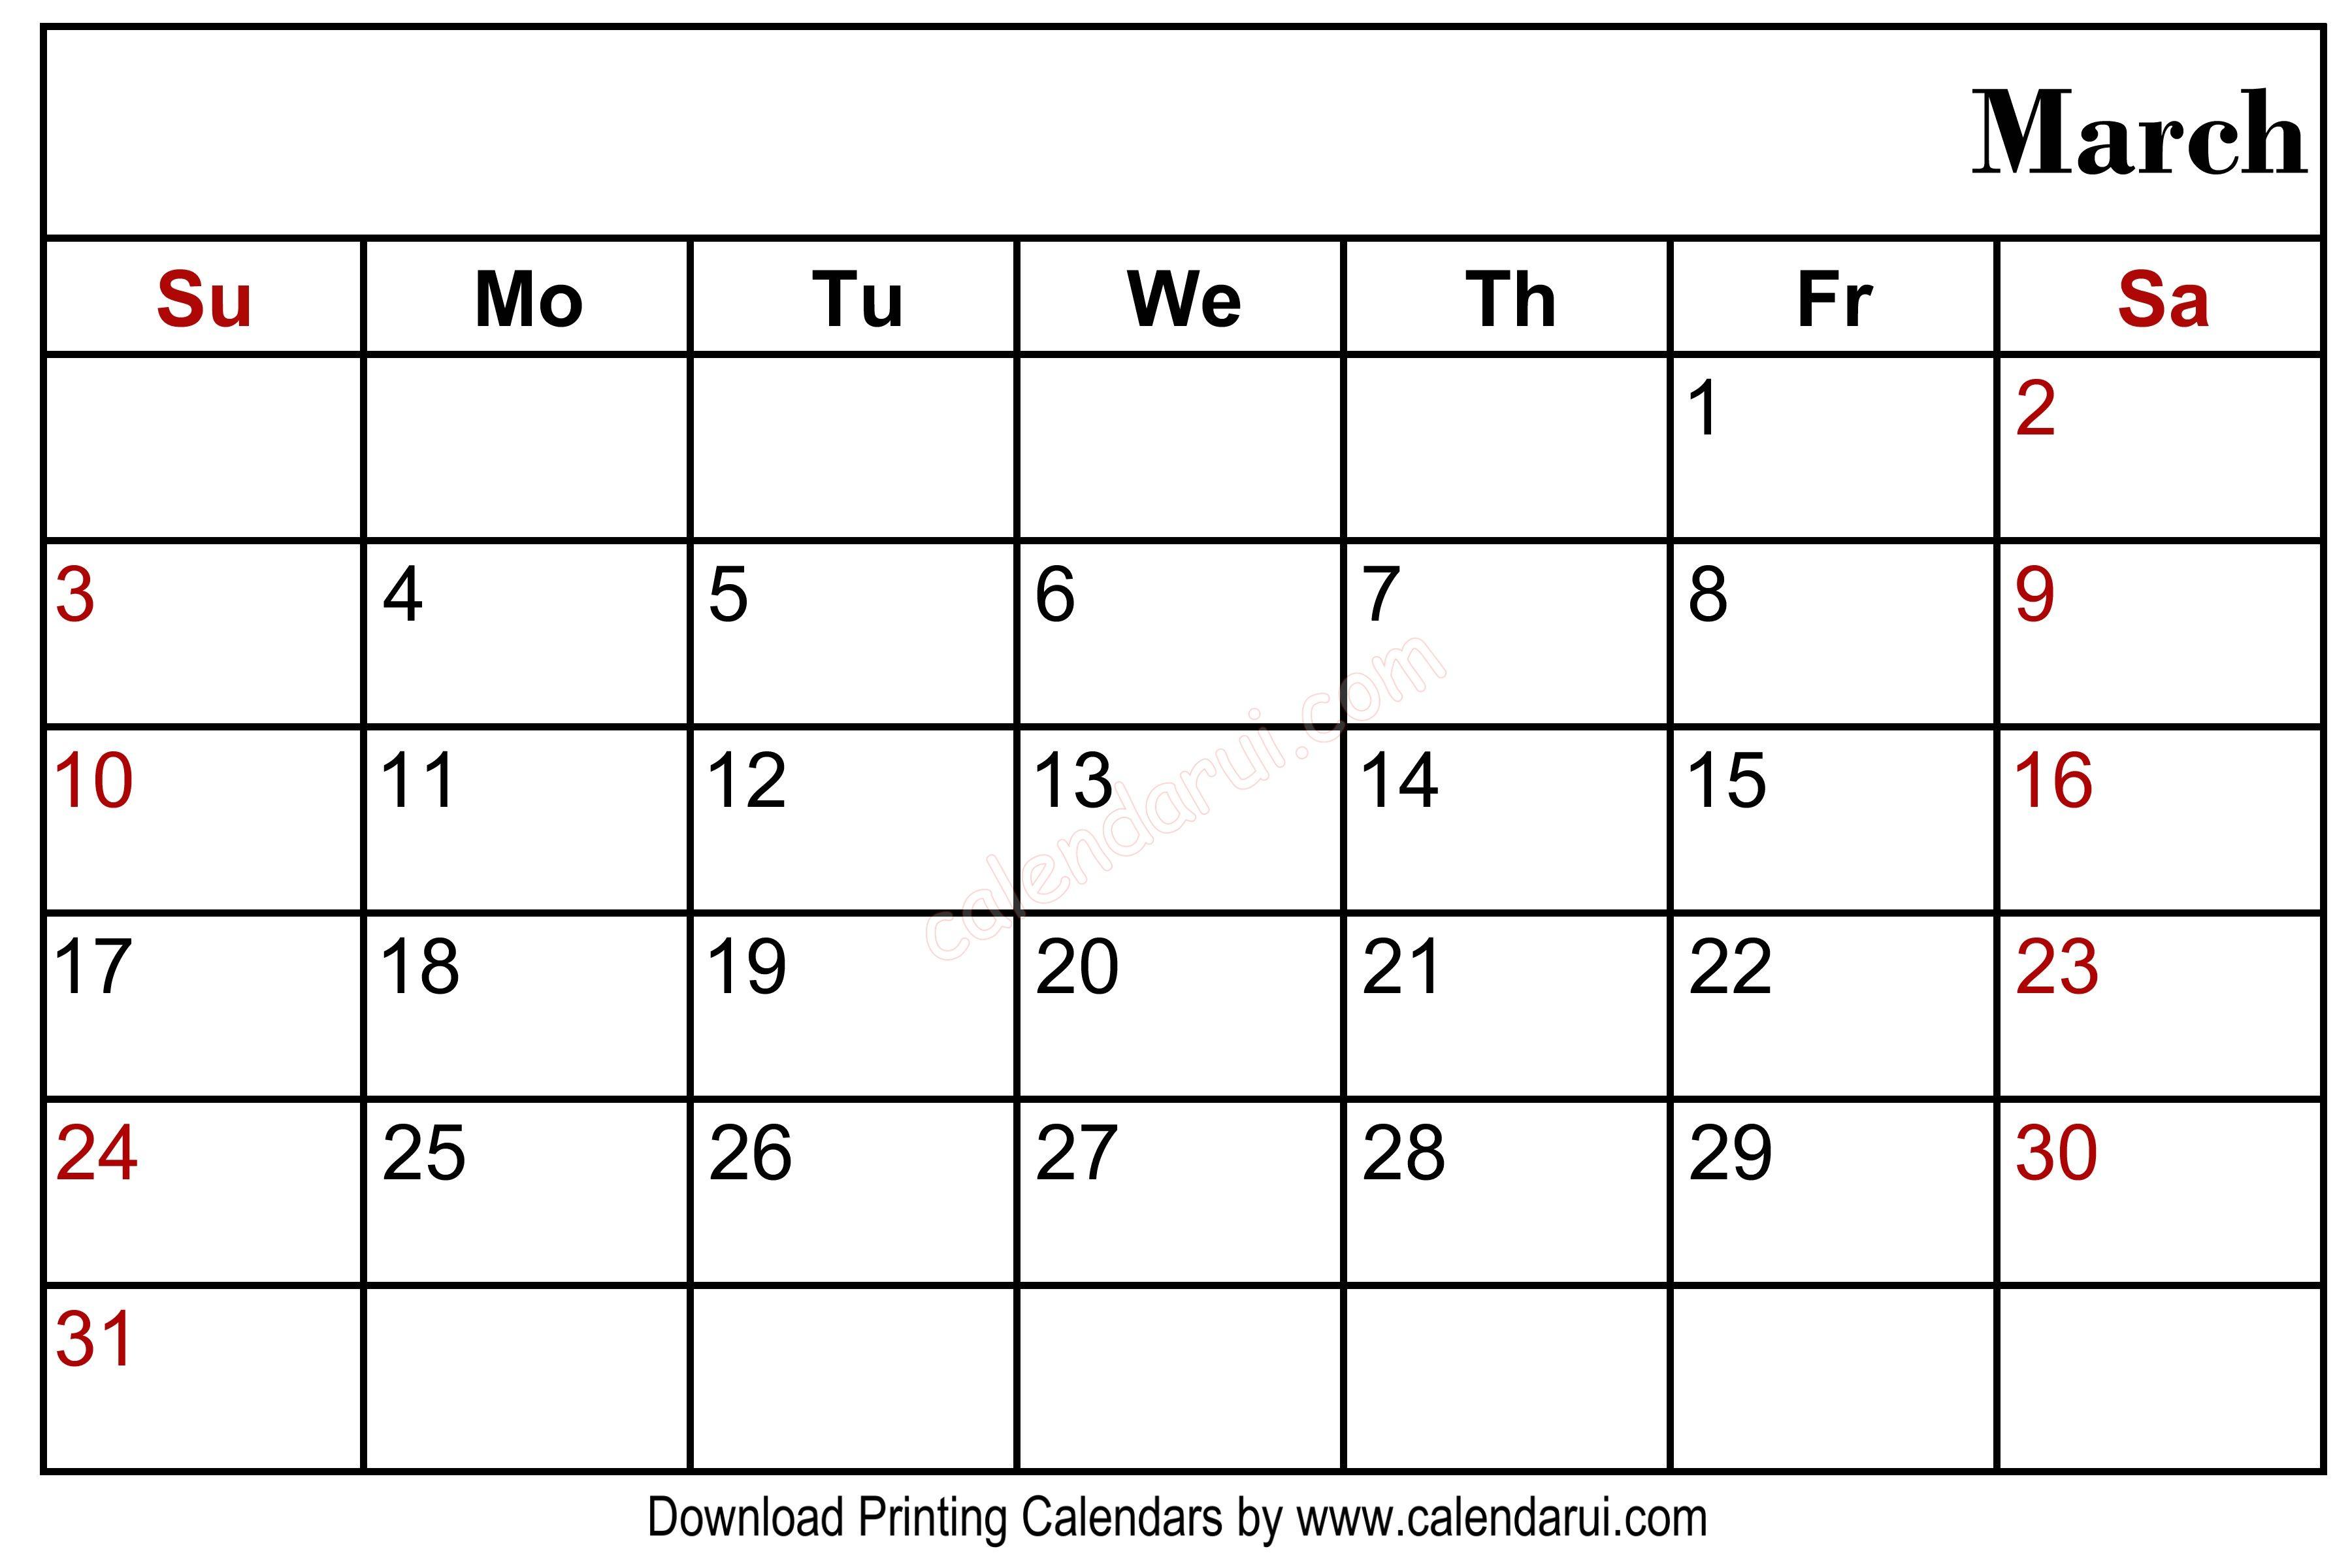 March 2020 Blank Calendar Printable Blank Calendar Template